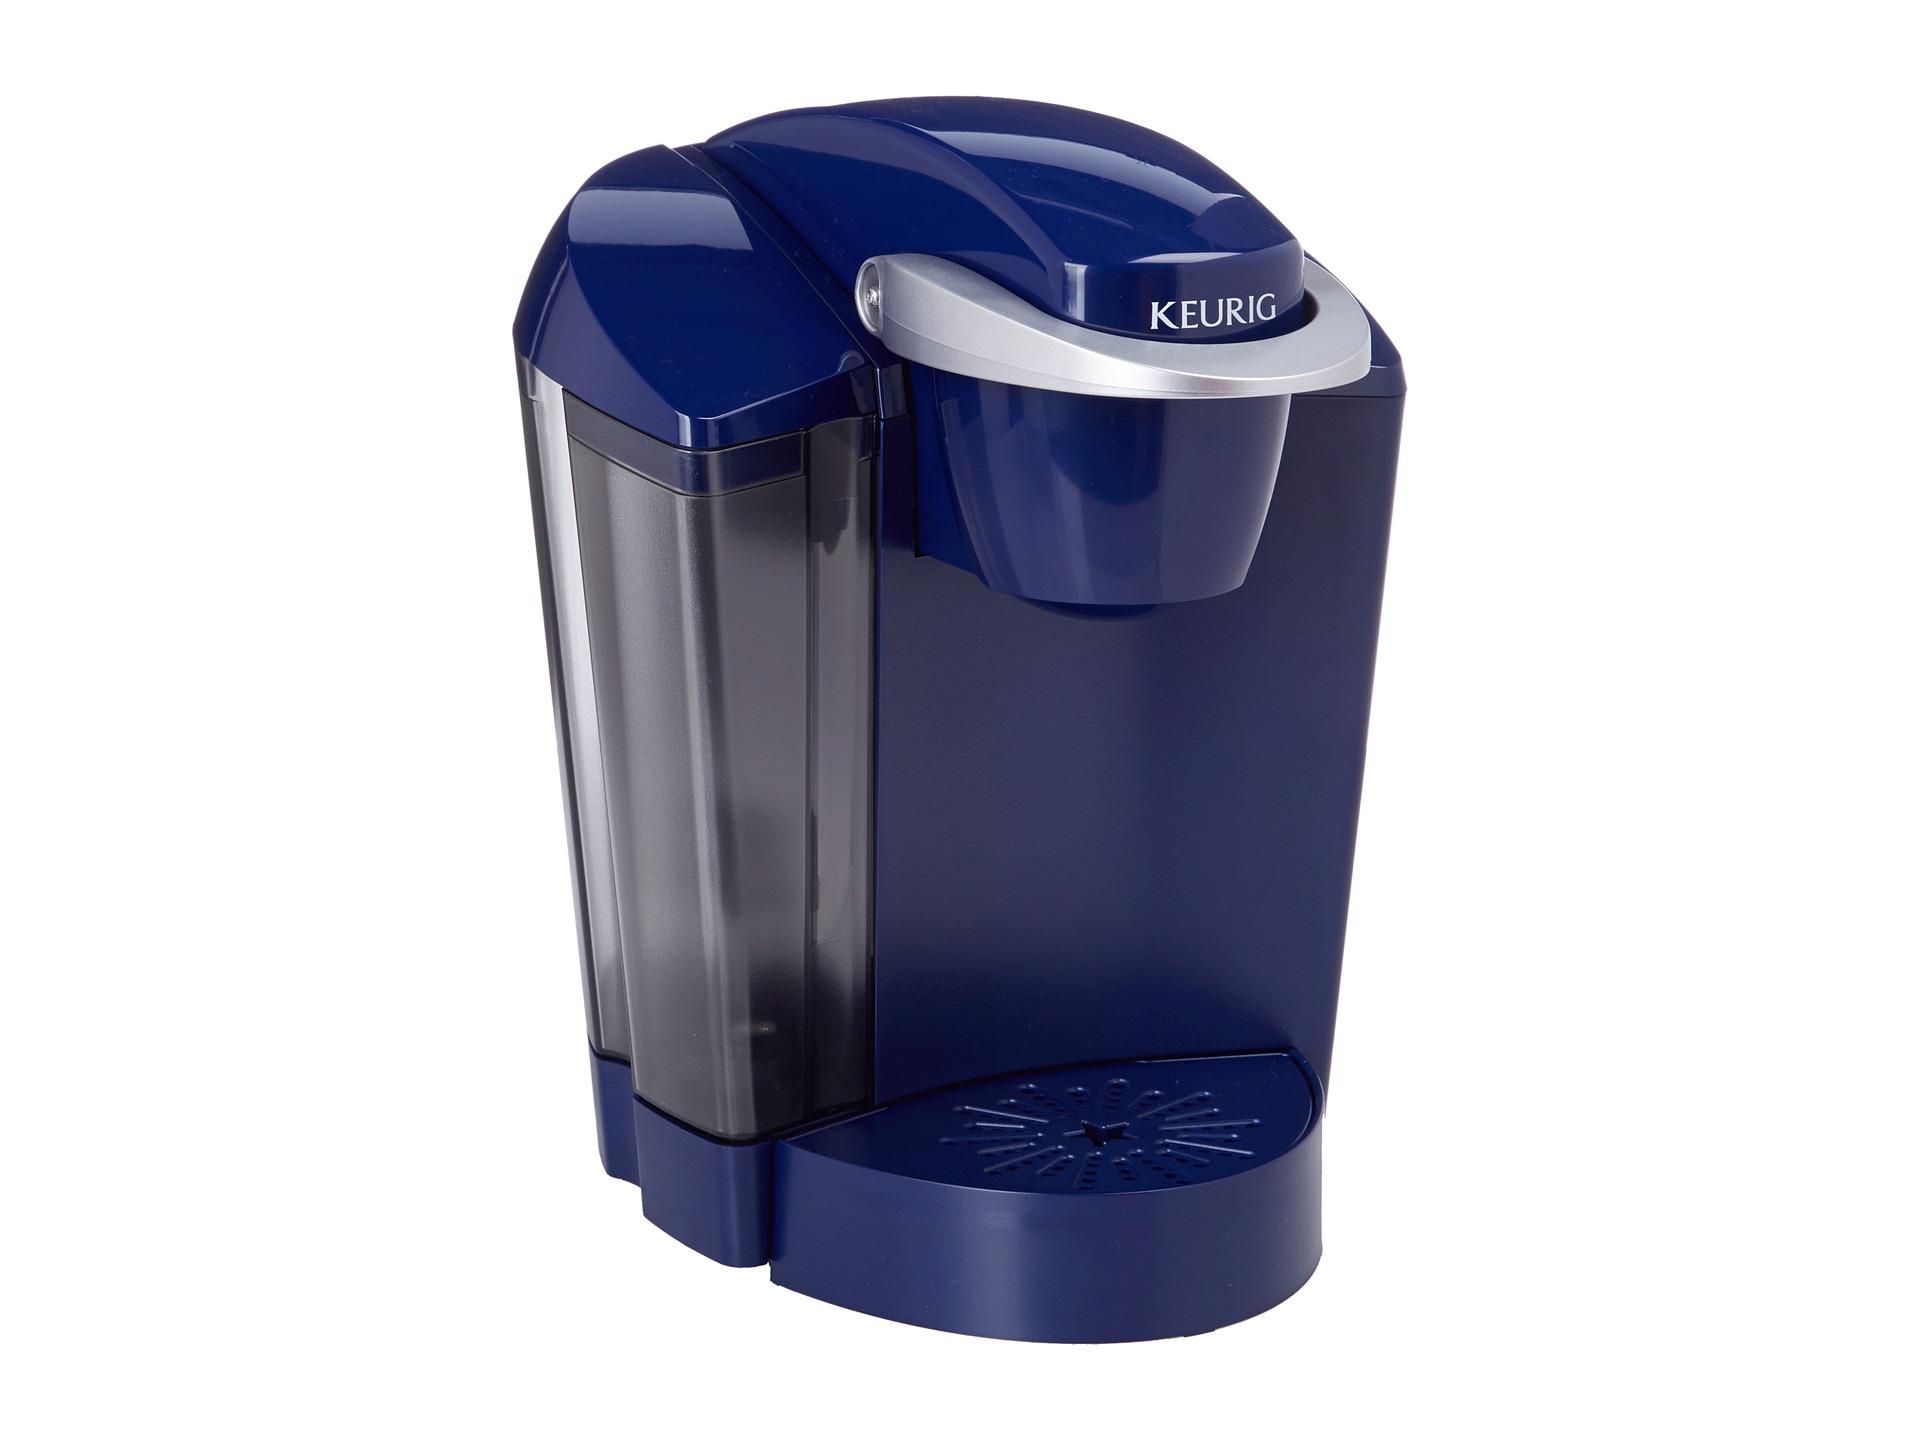 Keurig k45 deals on 1001 blocks for K45 elite